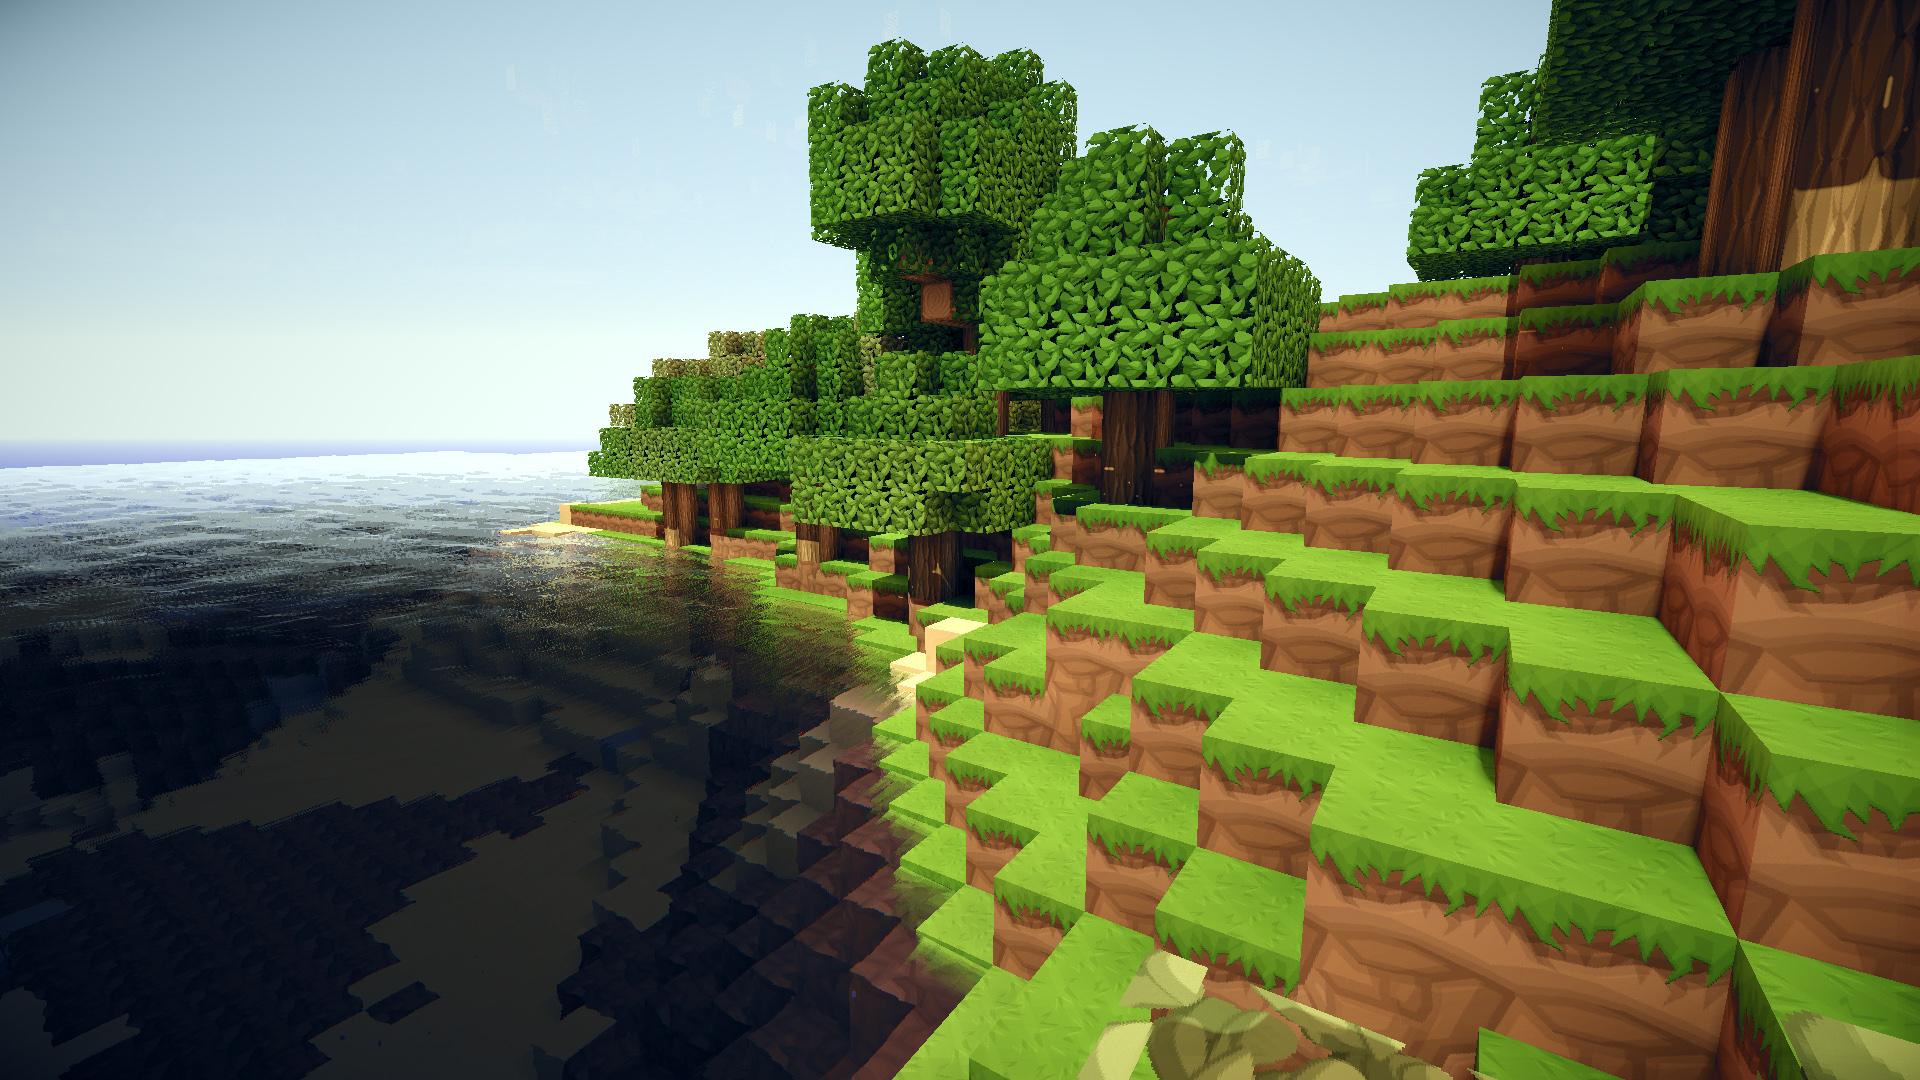 Free download Custom NPCs Mod 189 Minecraft Moddingde